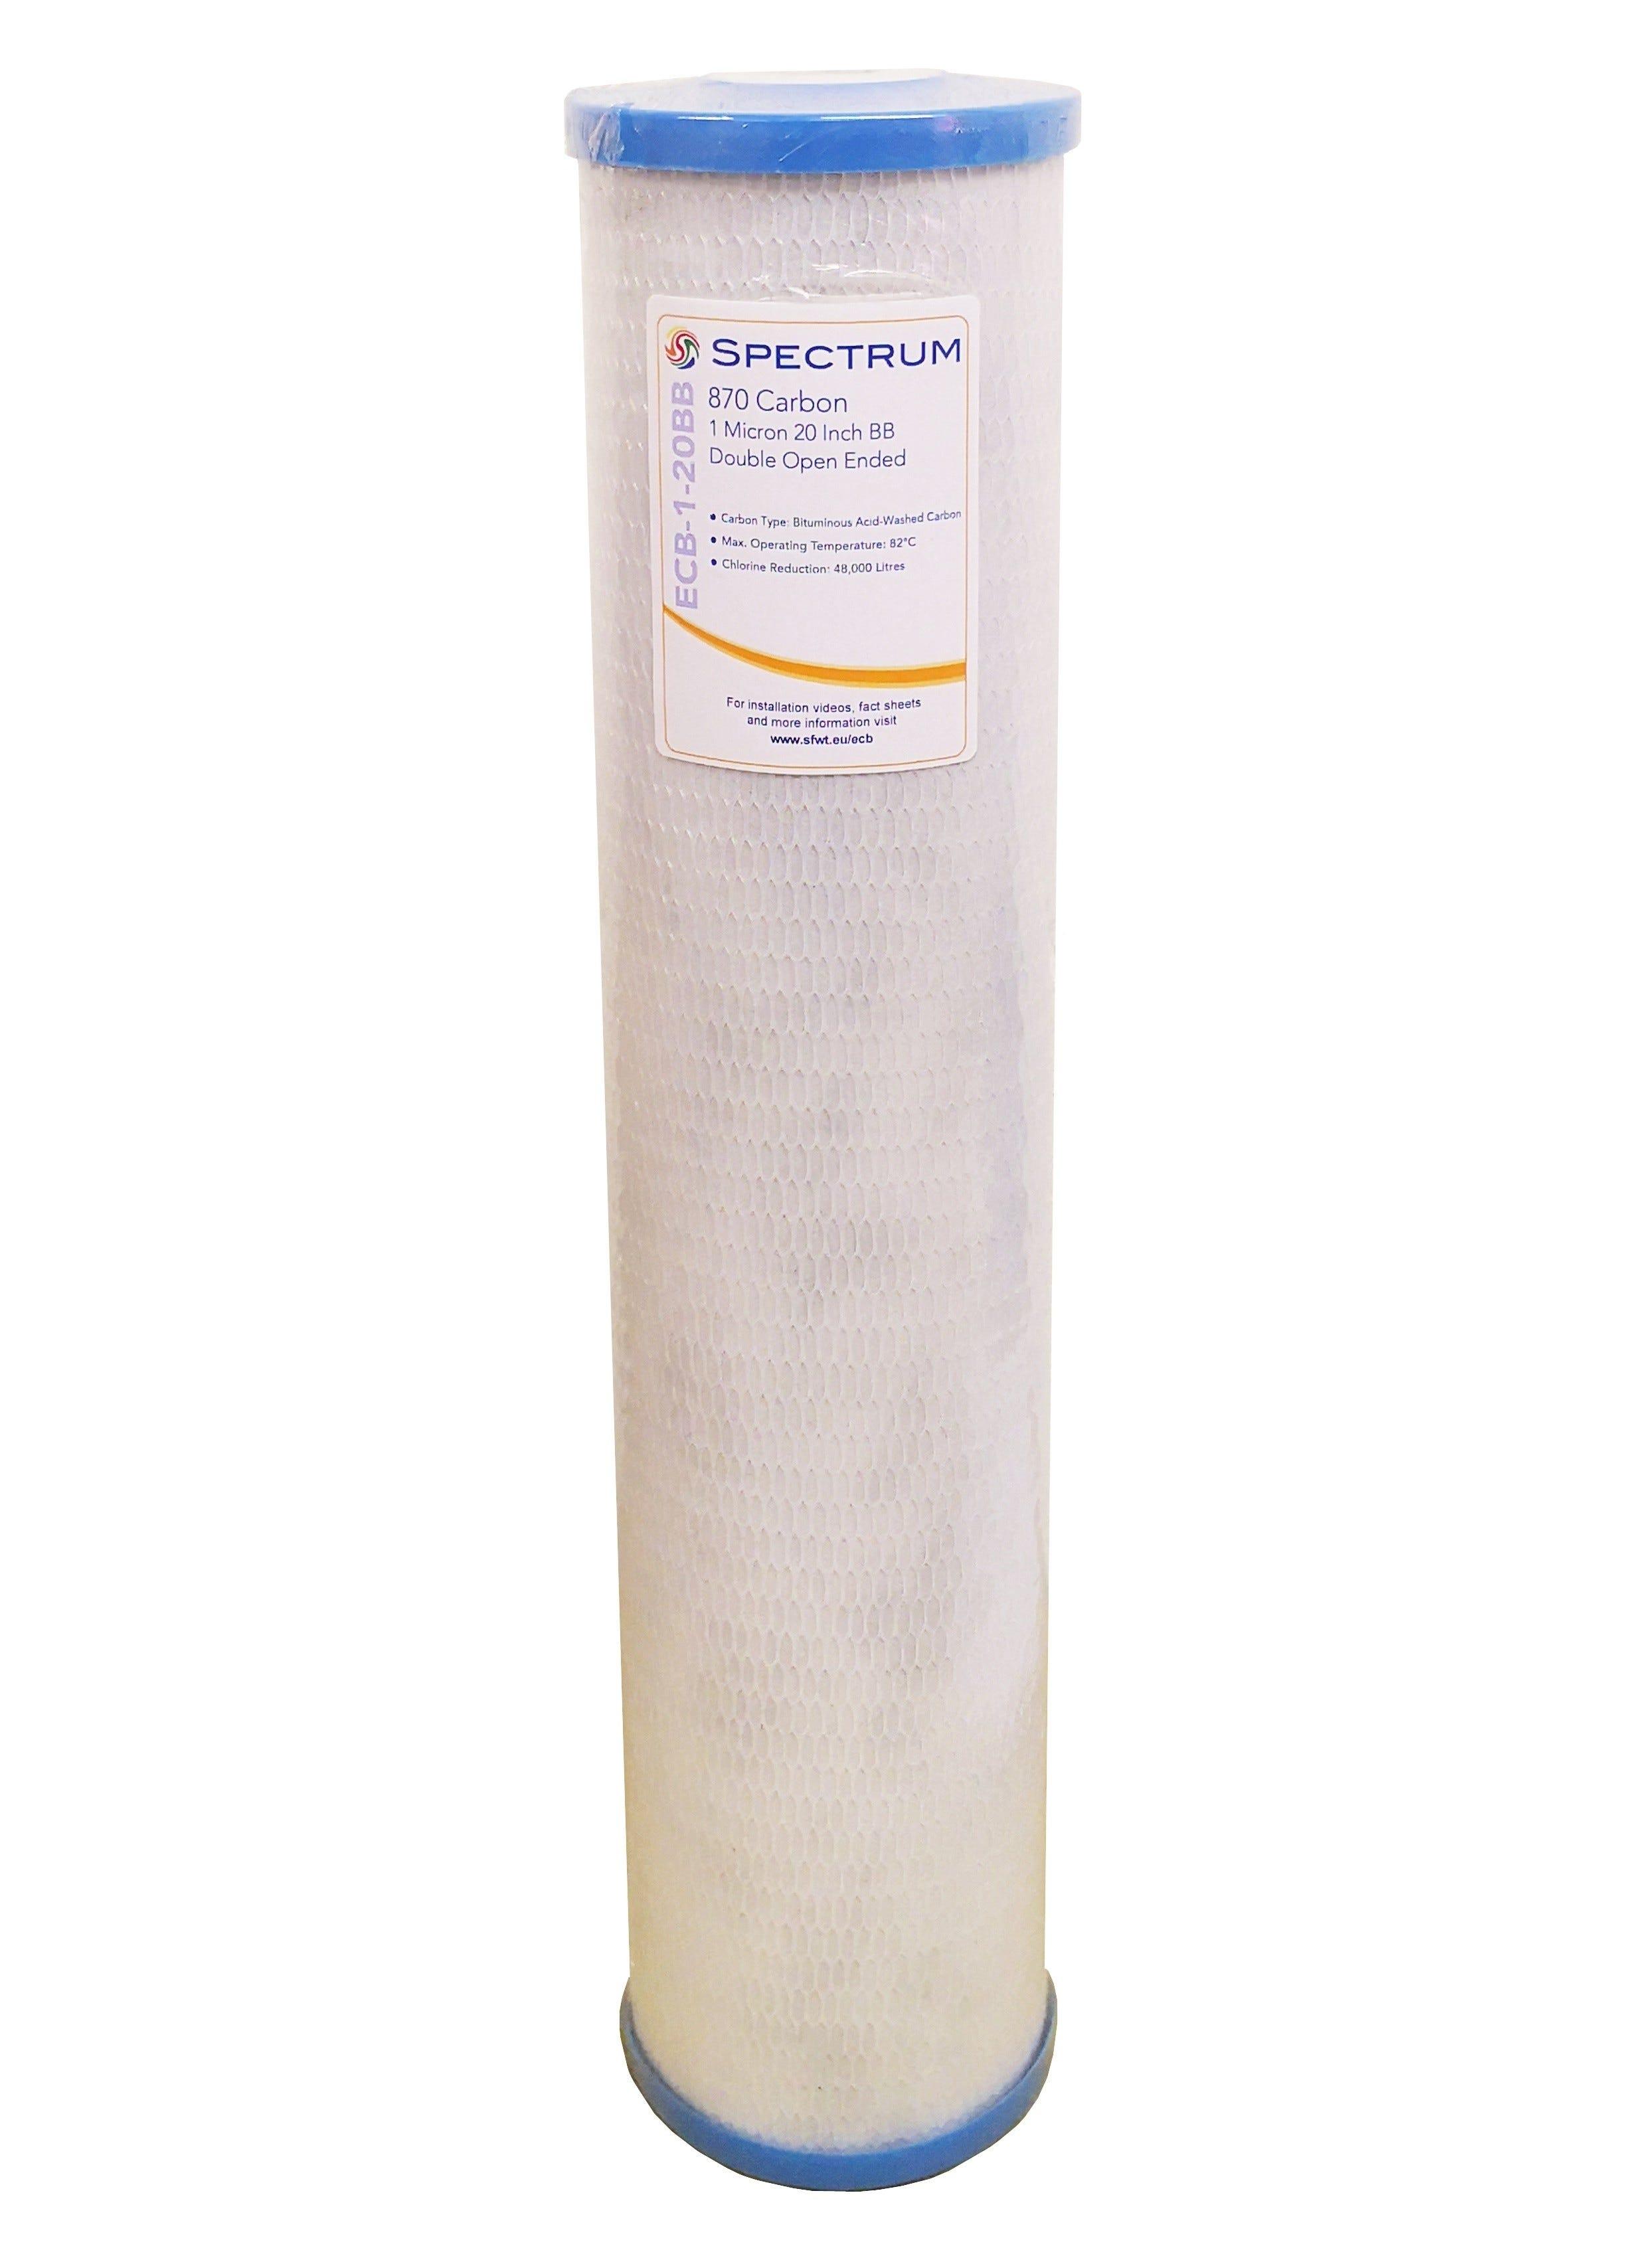 "Spectrum 870 20"" ECB Jumbo Carbon Block Filter"